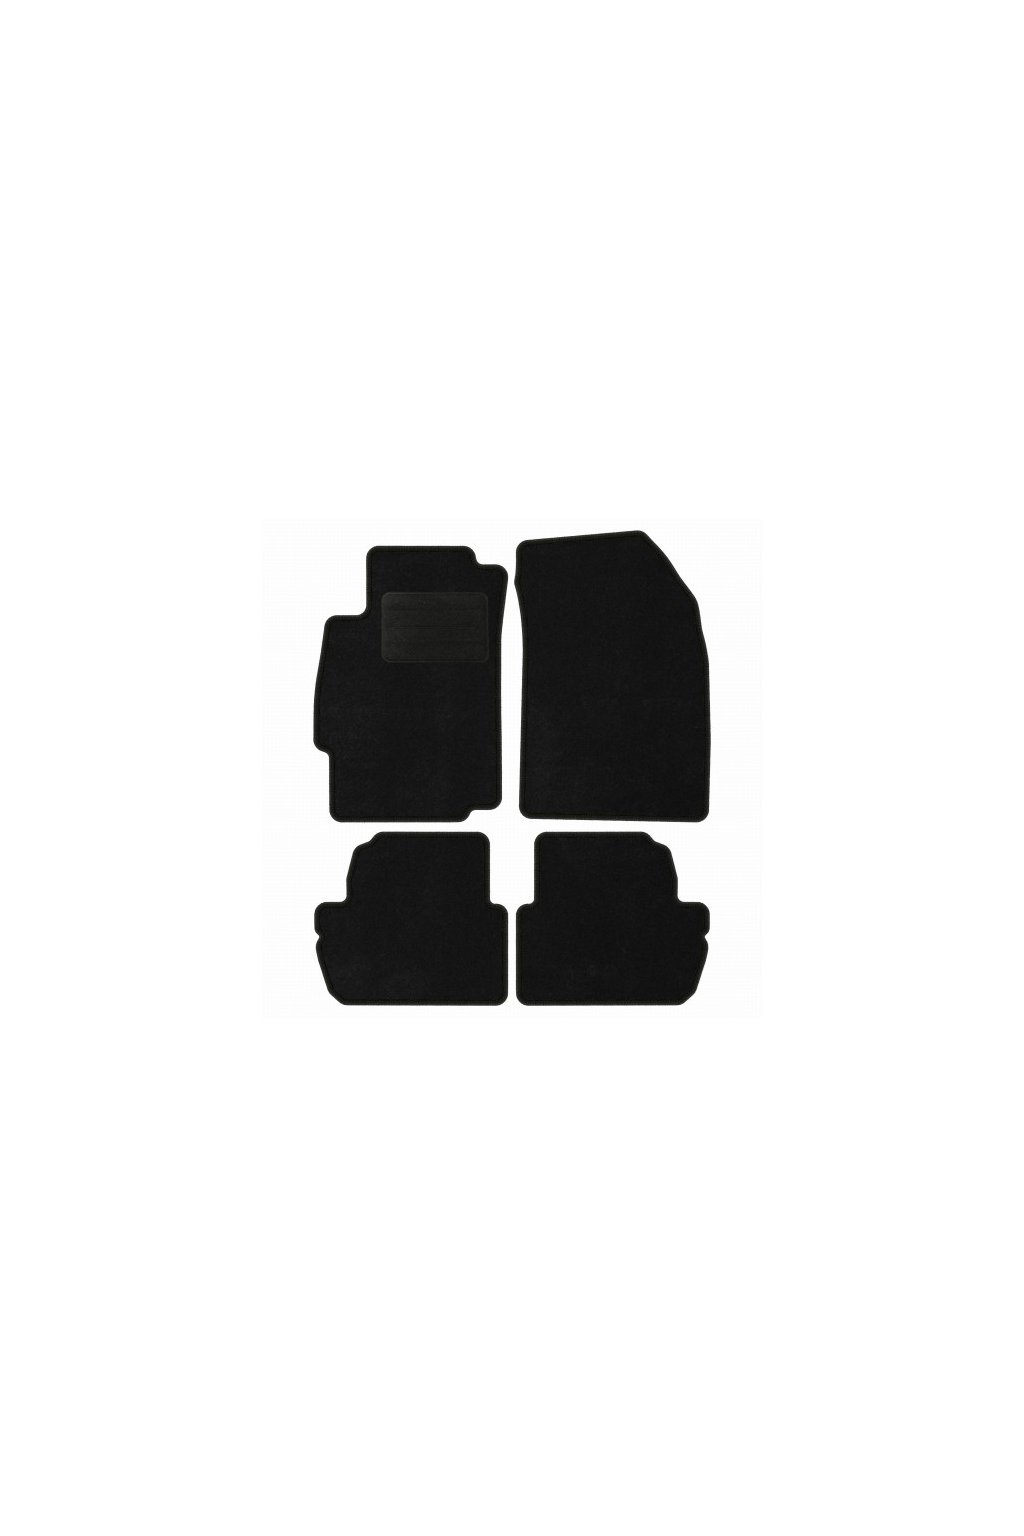 Koberce textilni ACR CHEVROLET Spark III [M300] 2012-2015 černá